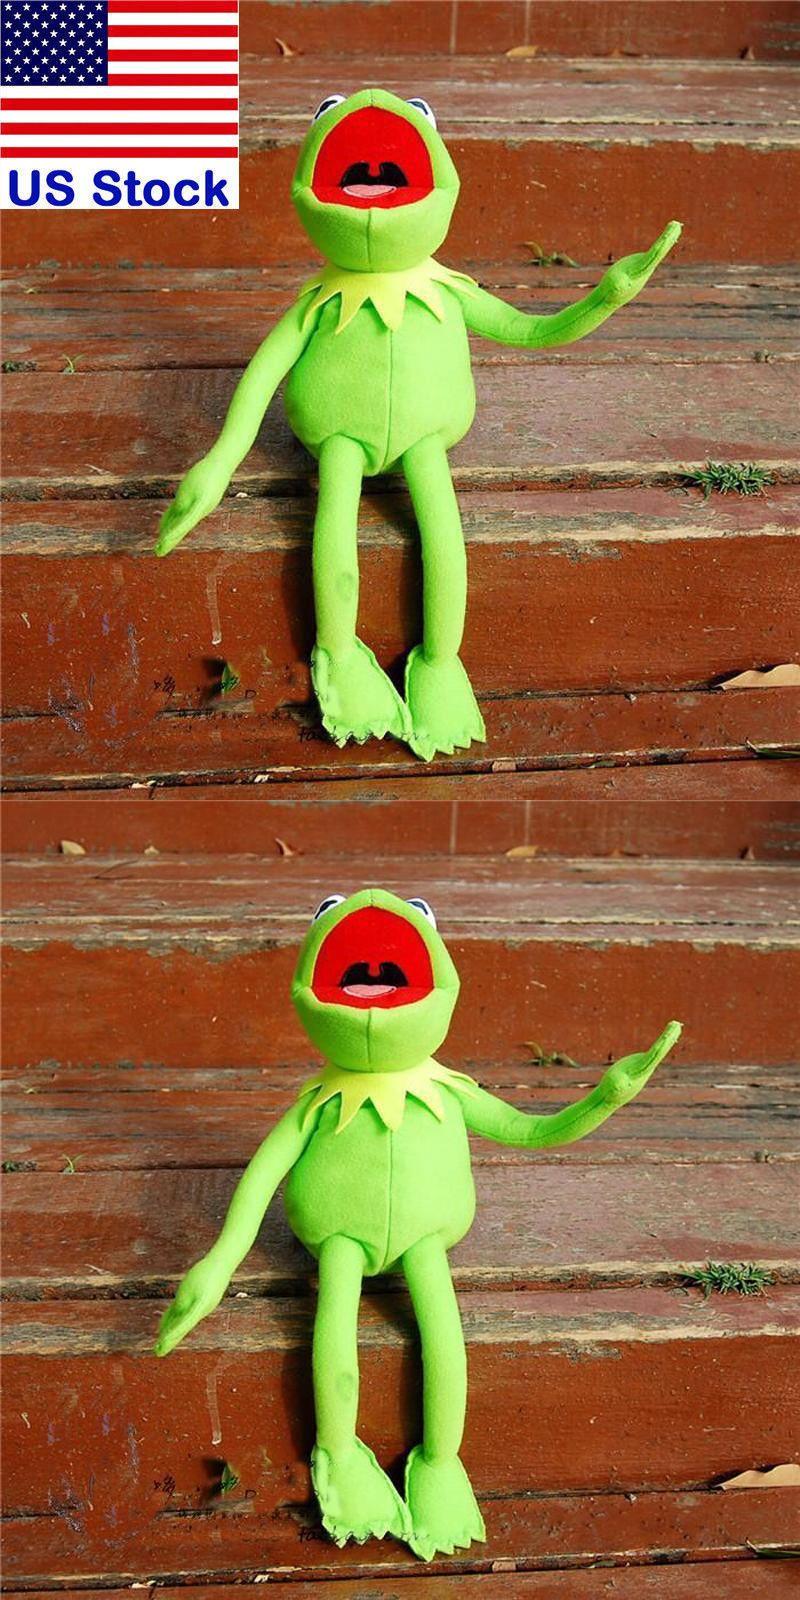 California Raisins 20904  18 New Kermit The Frog Sesame Street Muppet Frog  Plush Toy With cda554989c2f